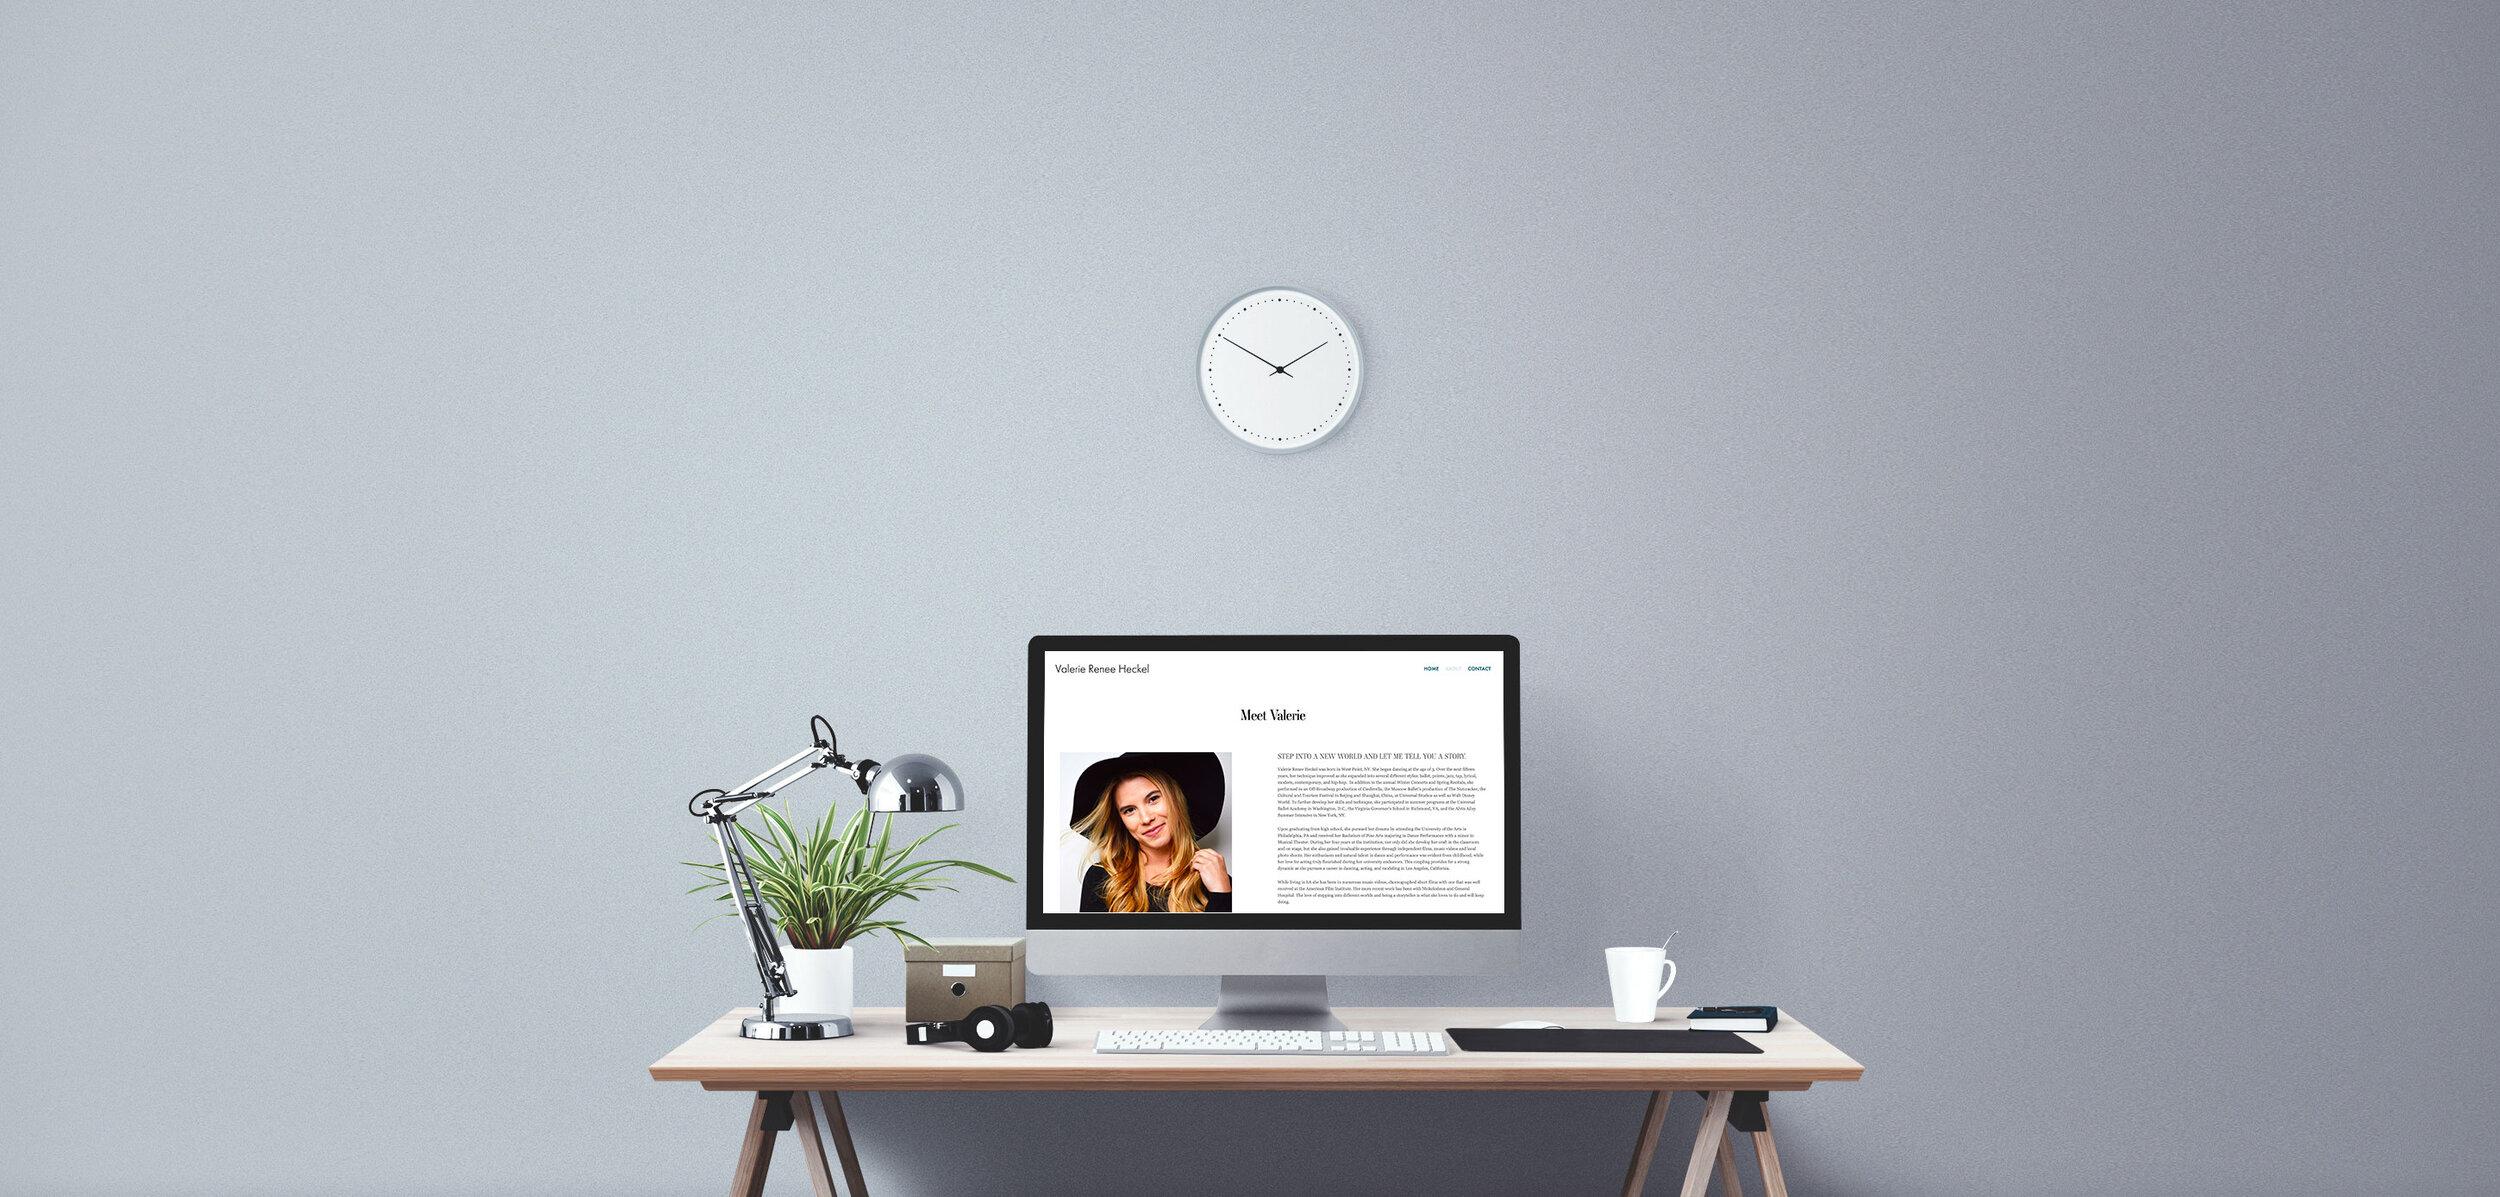 vrh-website-desktop.jpg